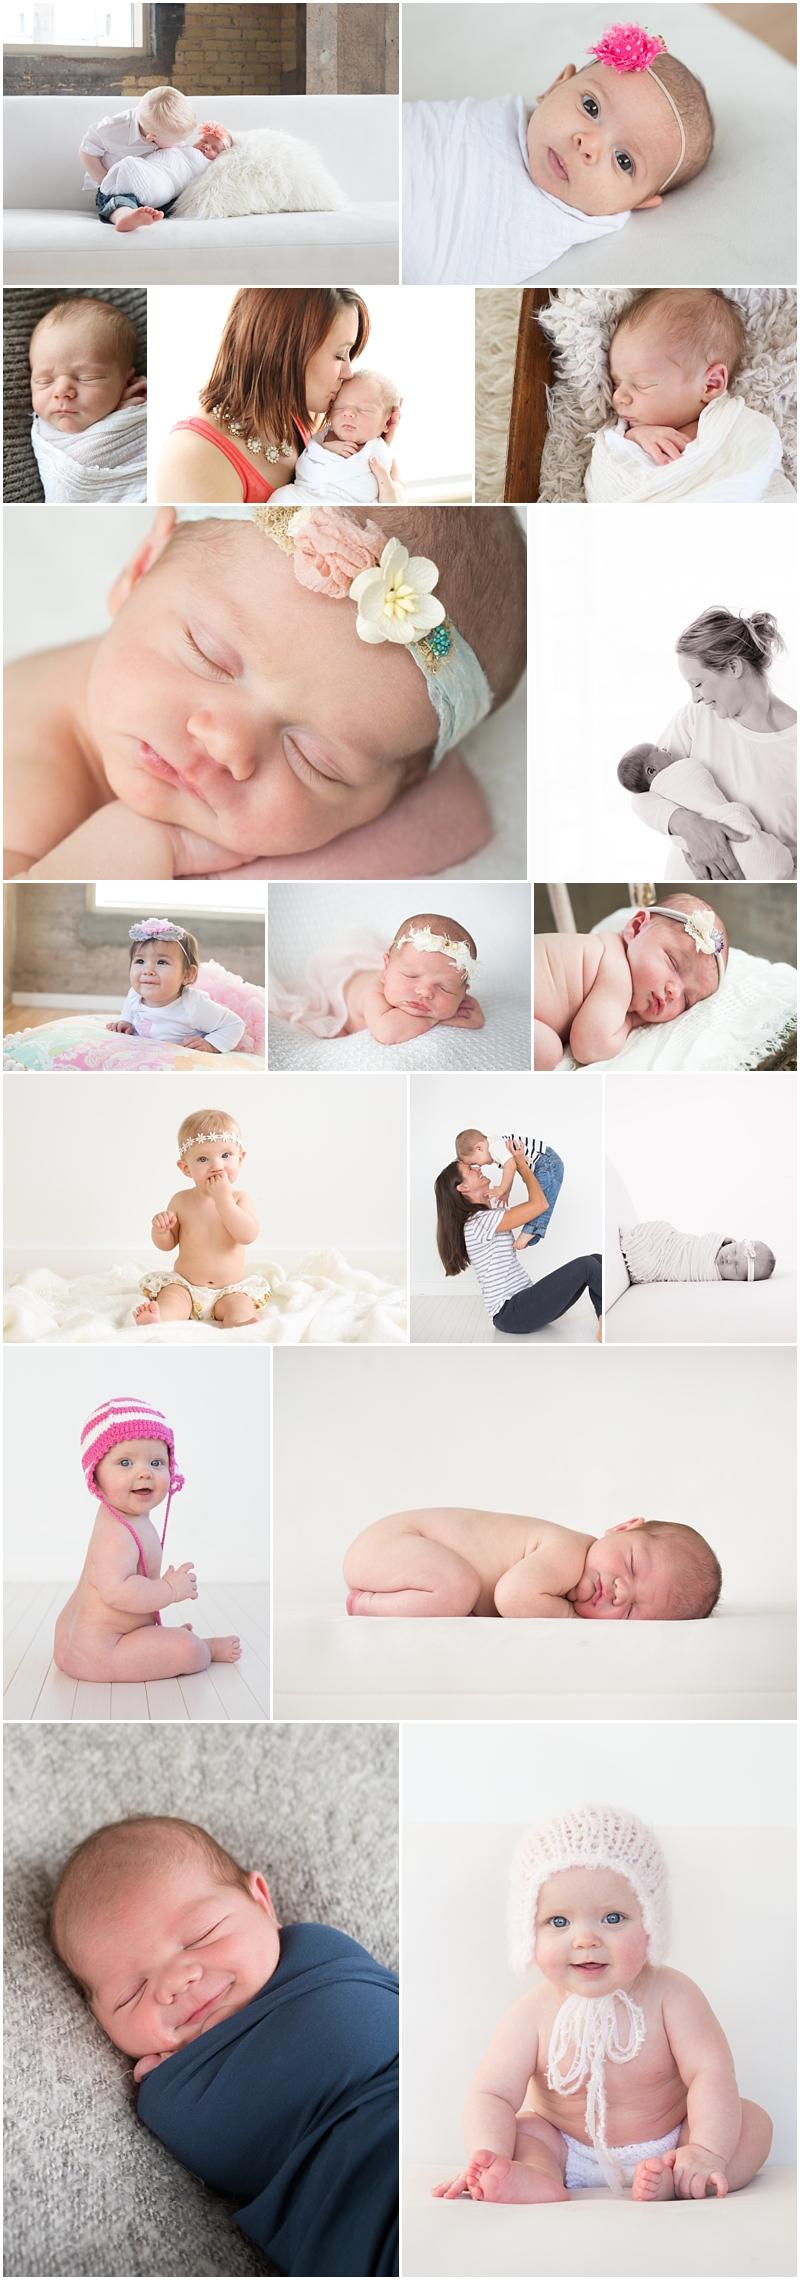 caitlin killoran photography - fargo newborn photographer